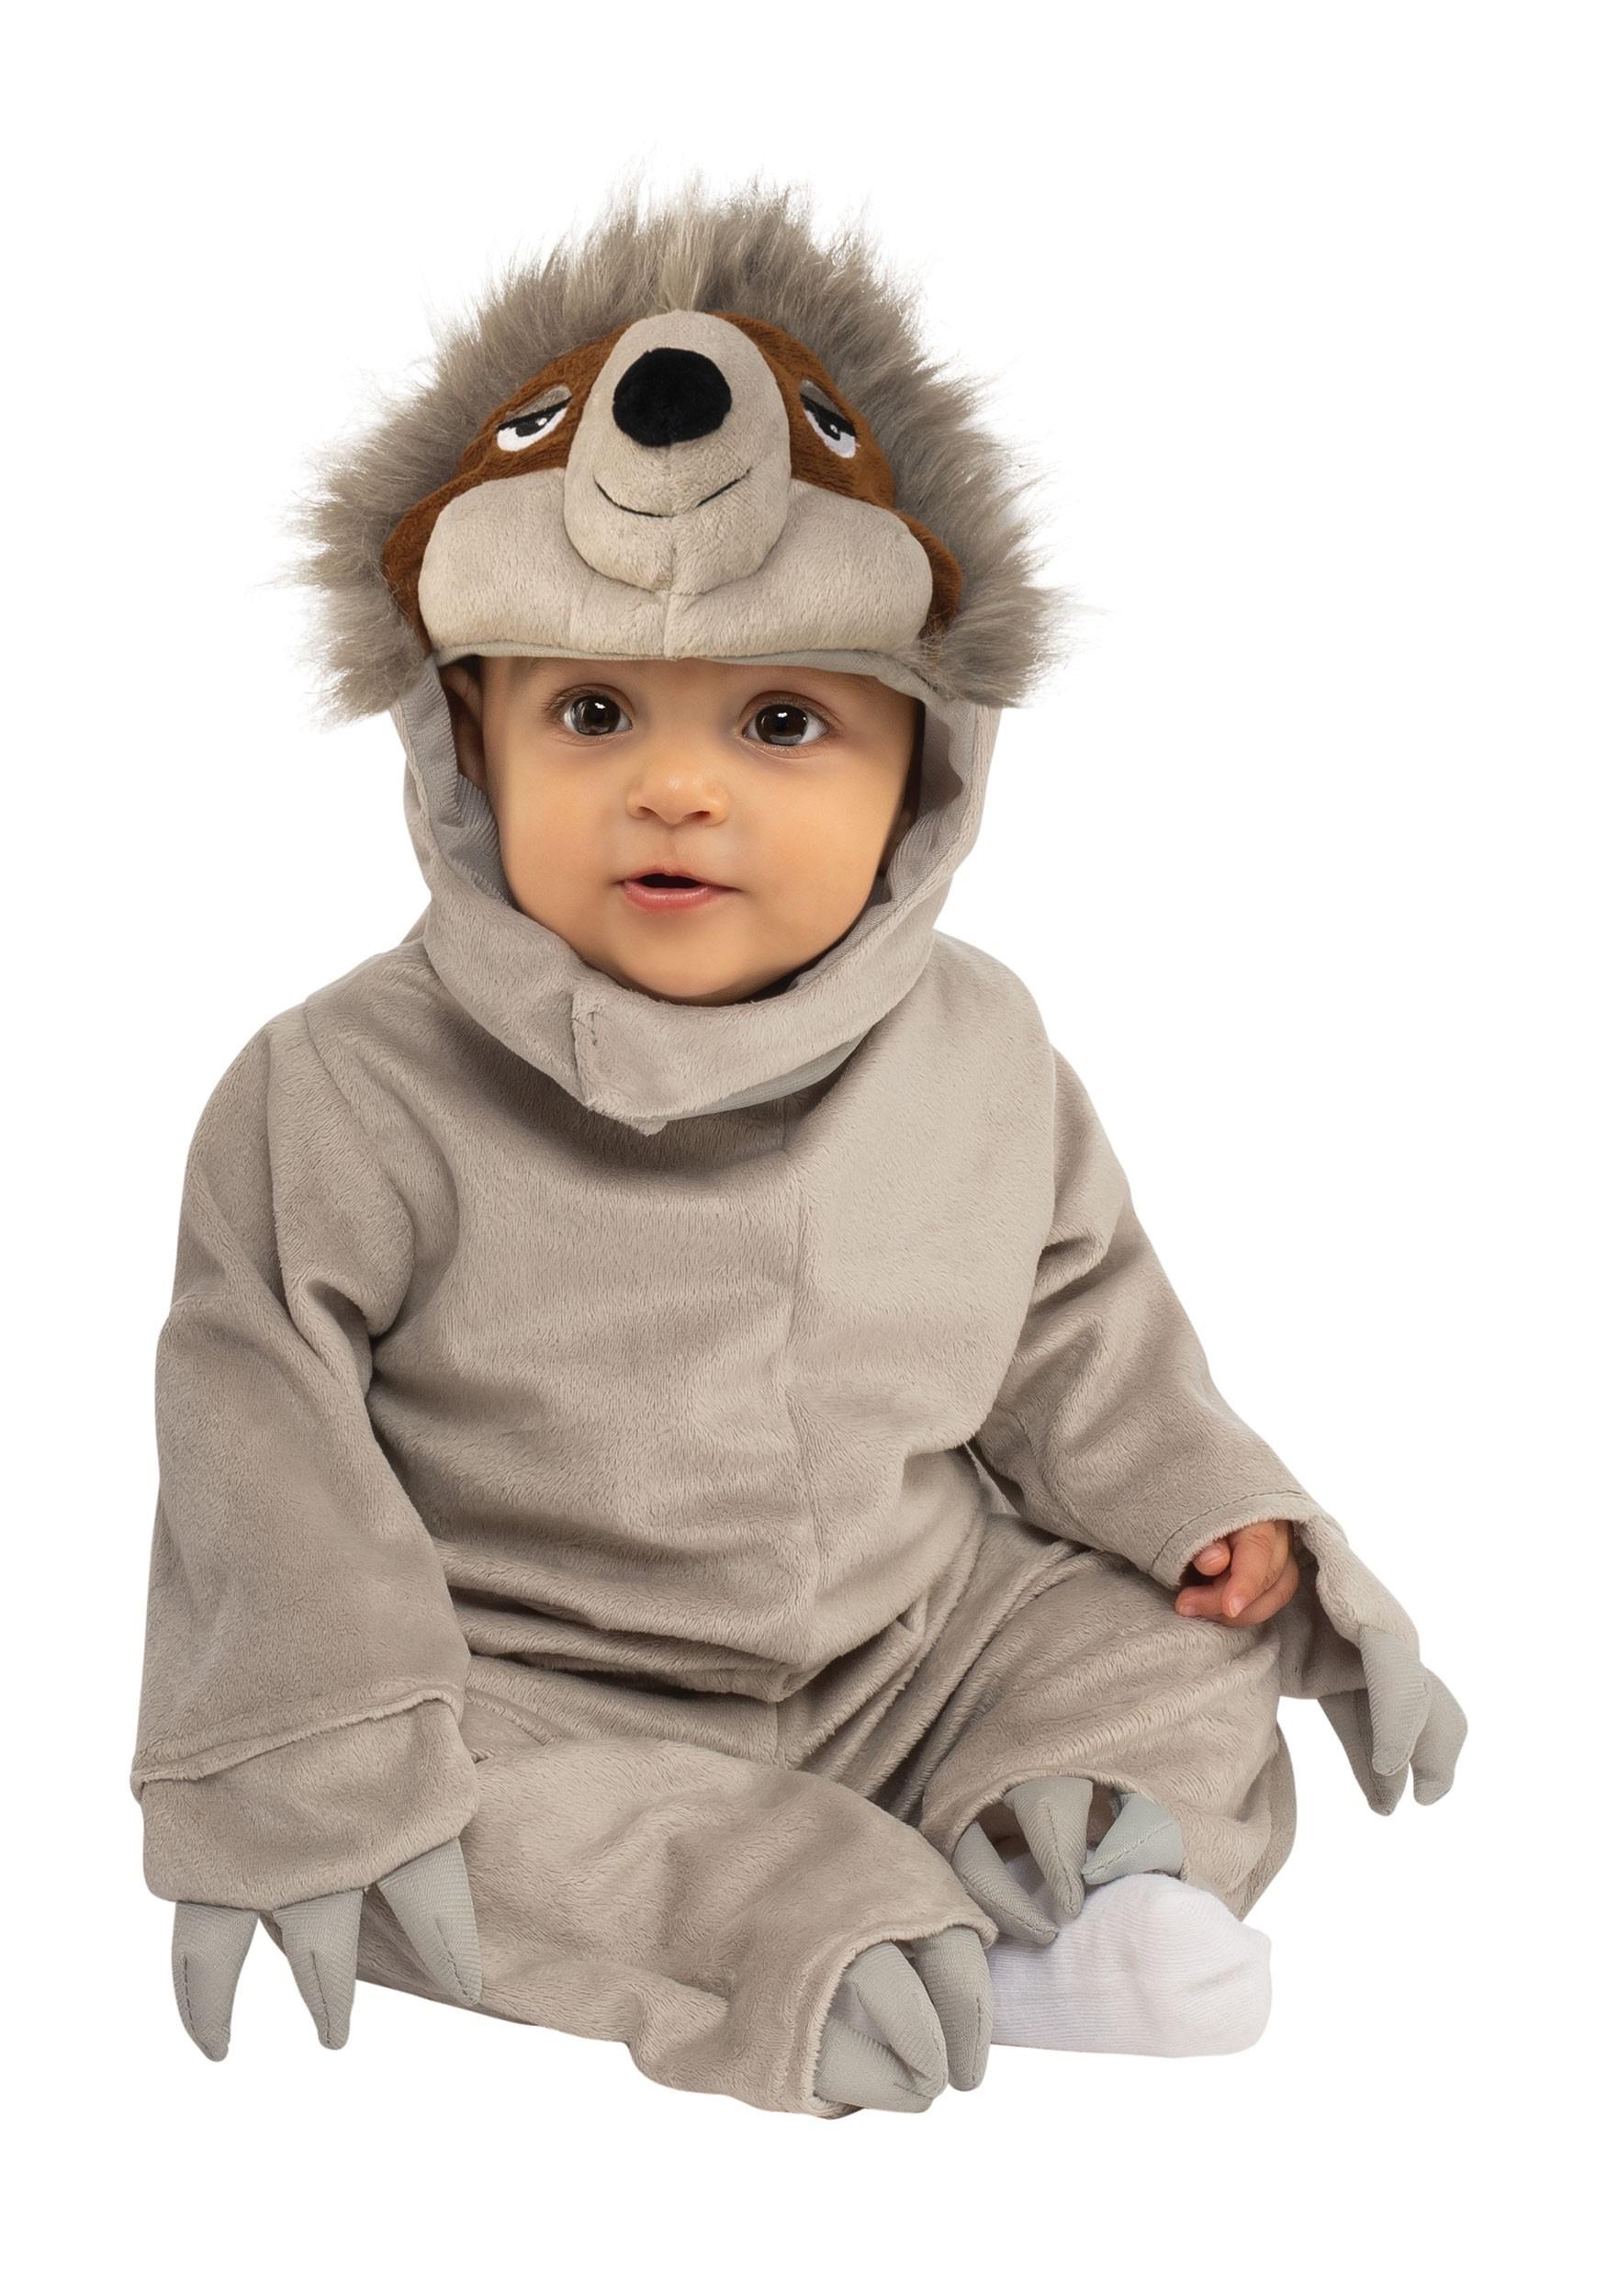 Li'l Cuties Toddler's Sloth Costume